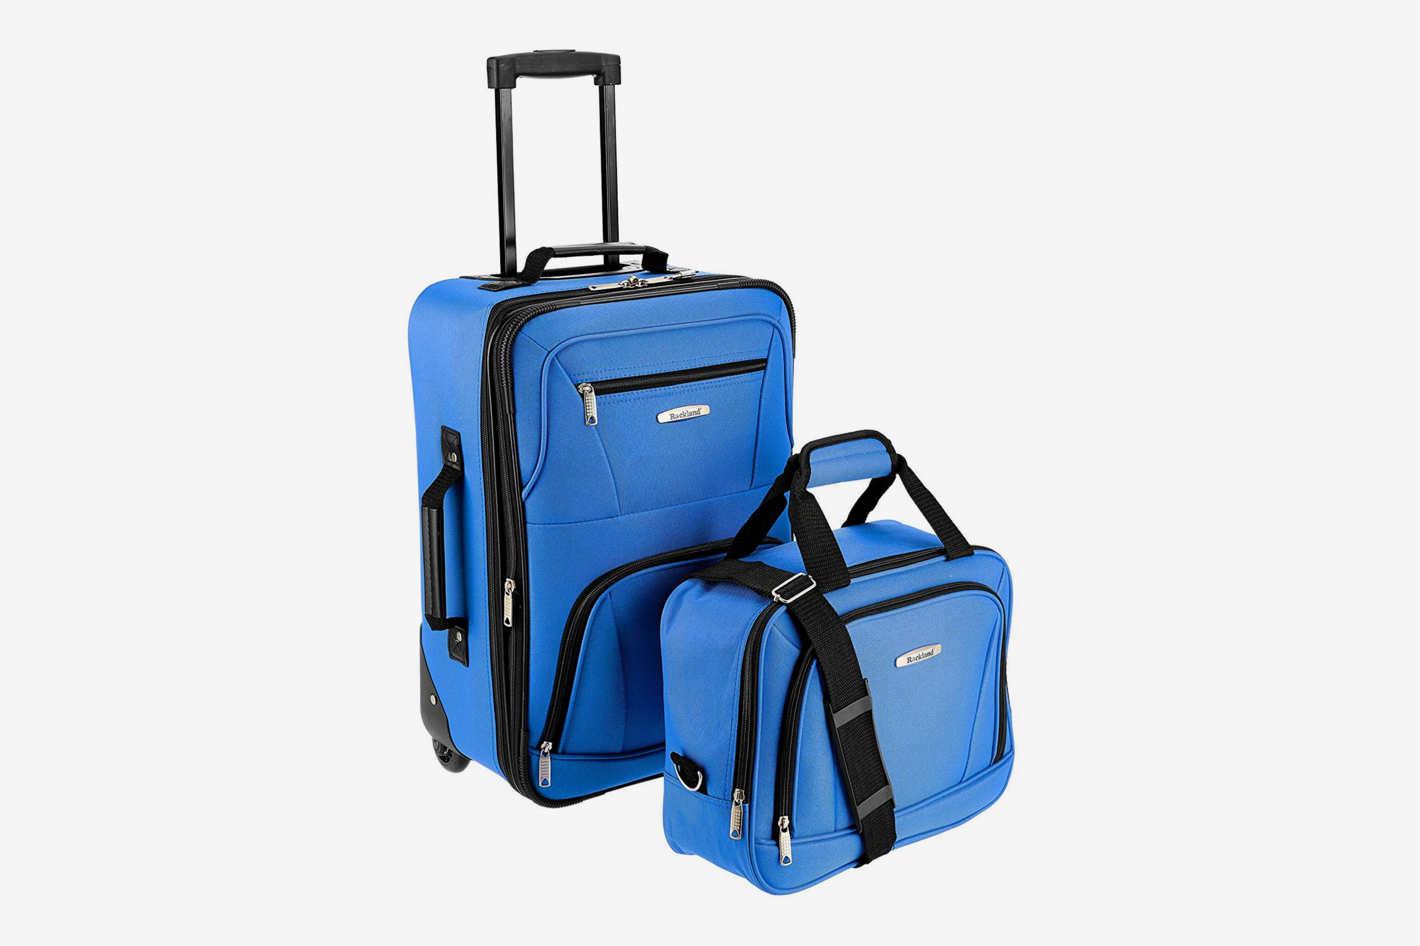 Rockland Luggage 2 Piece Set